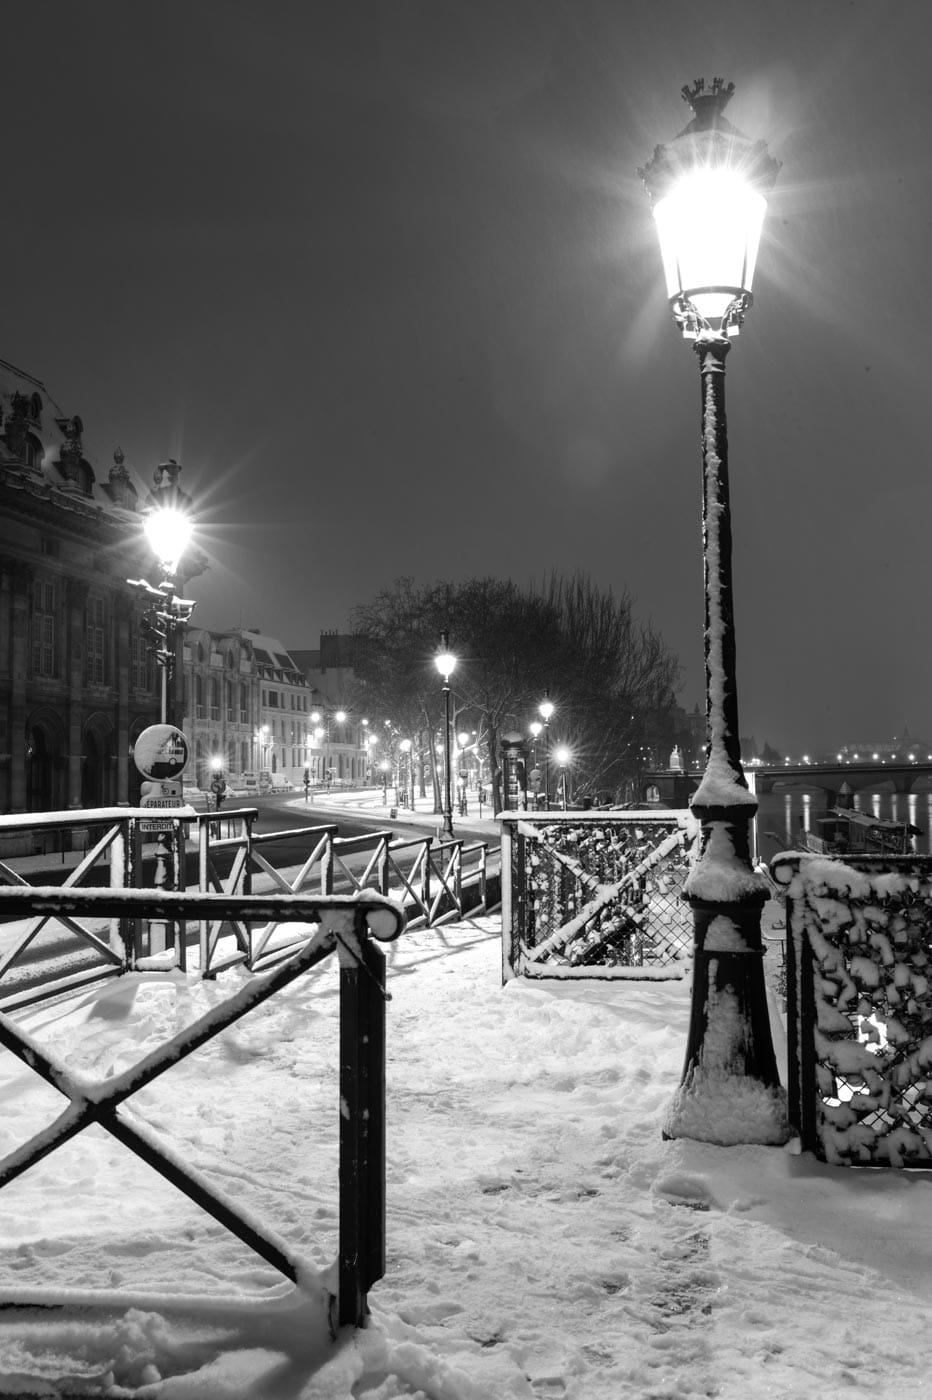 Light in Snow